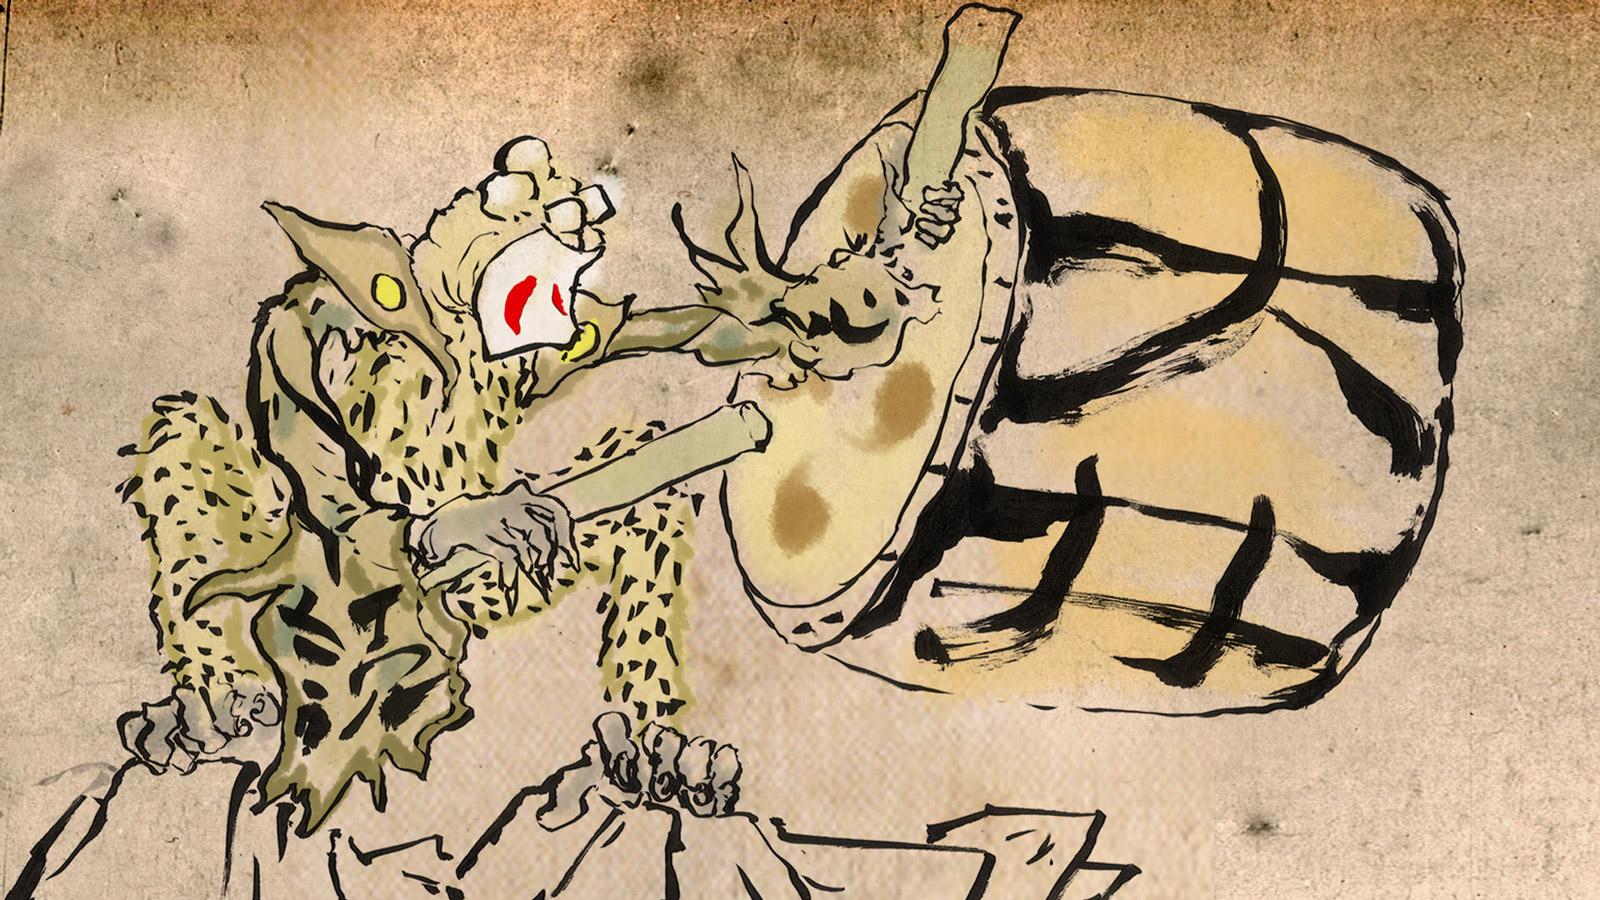 Free Okami Wallpaper in 1600x900